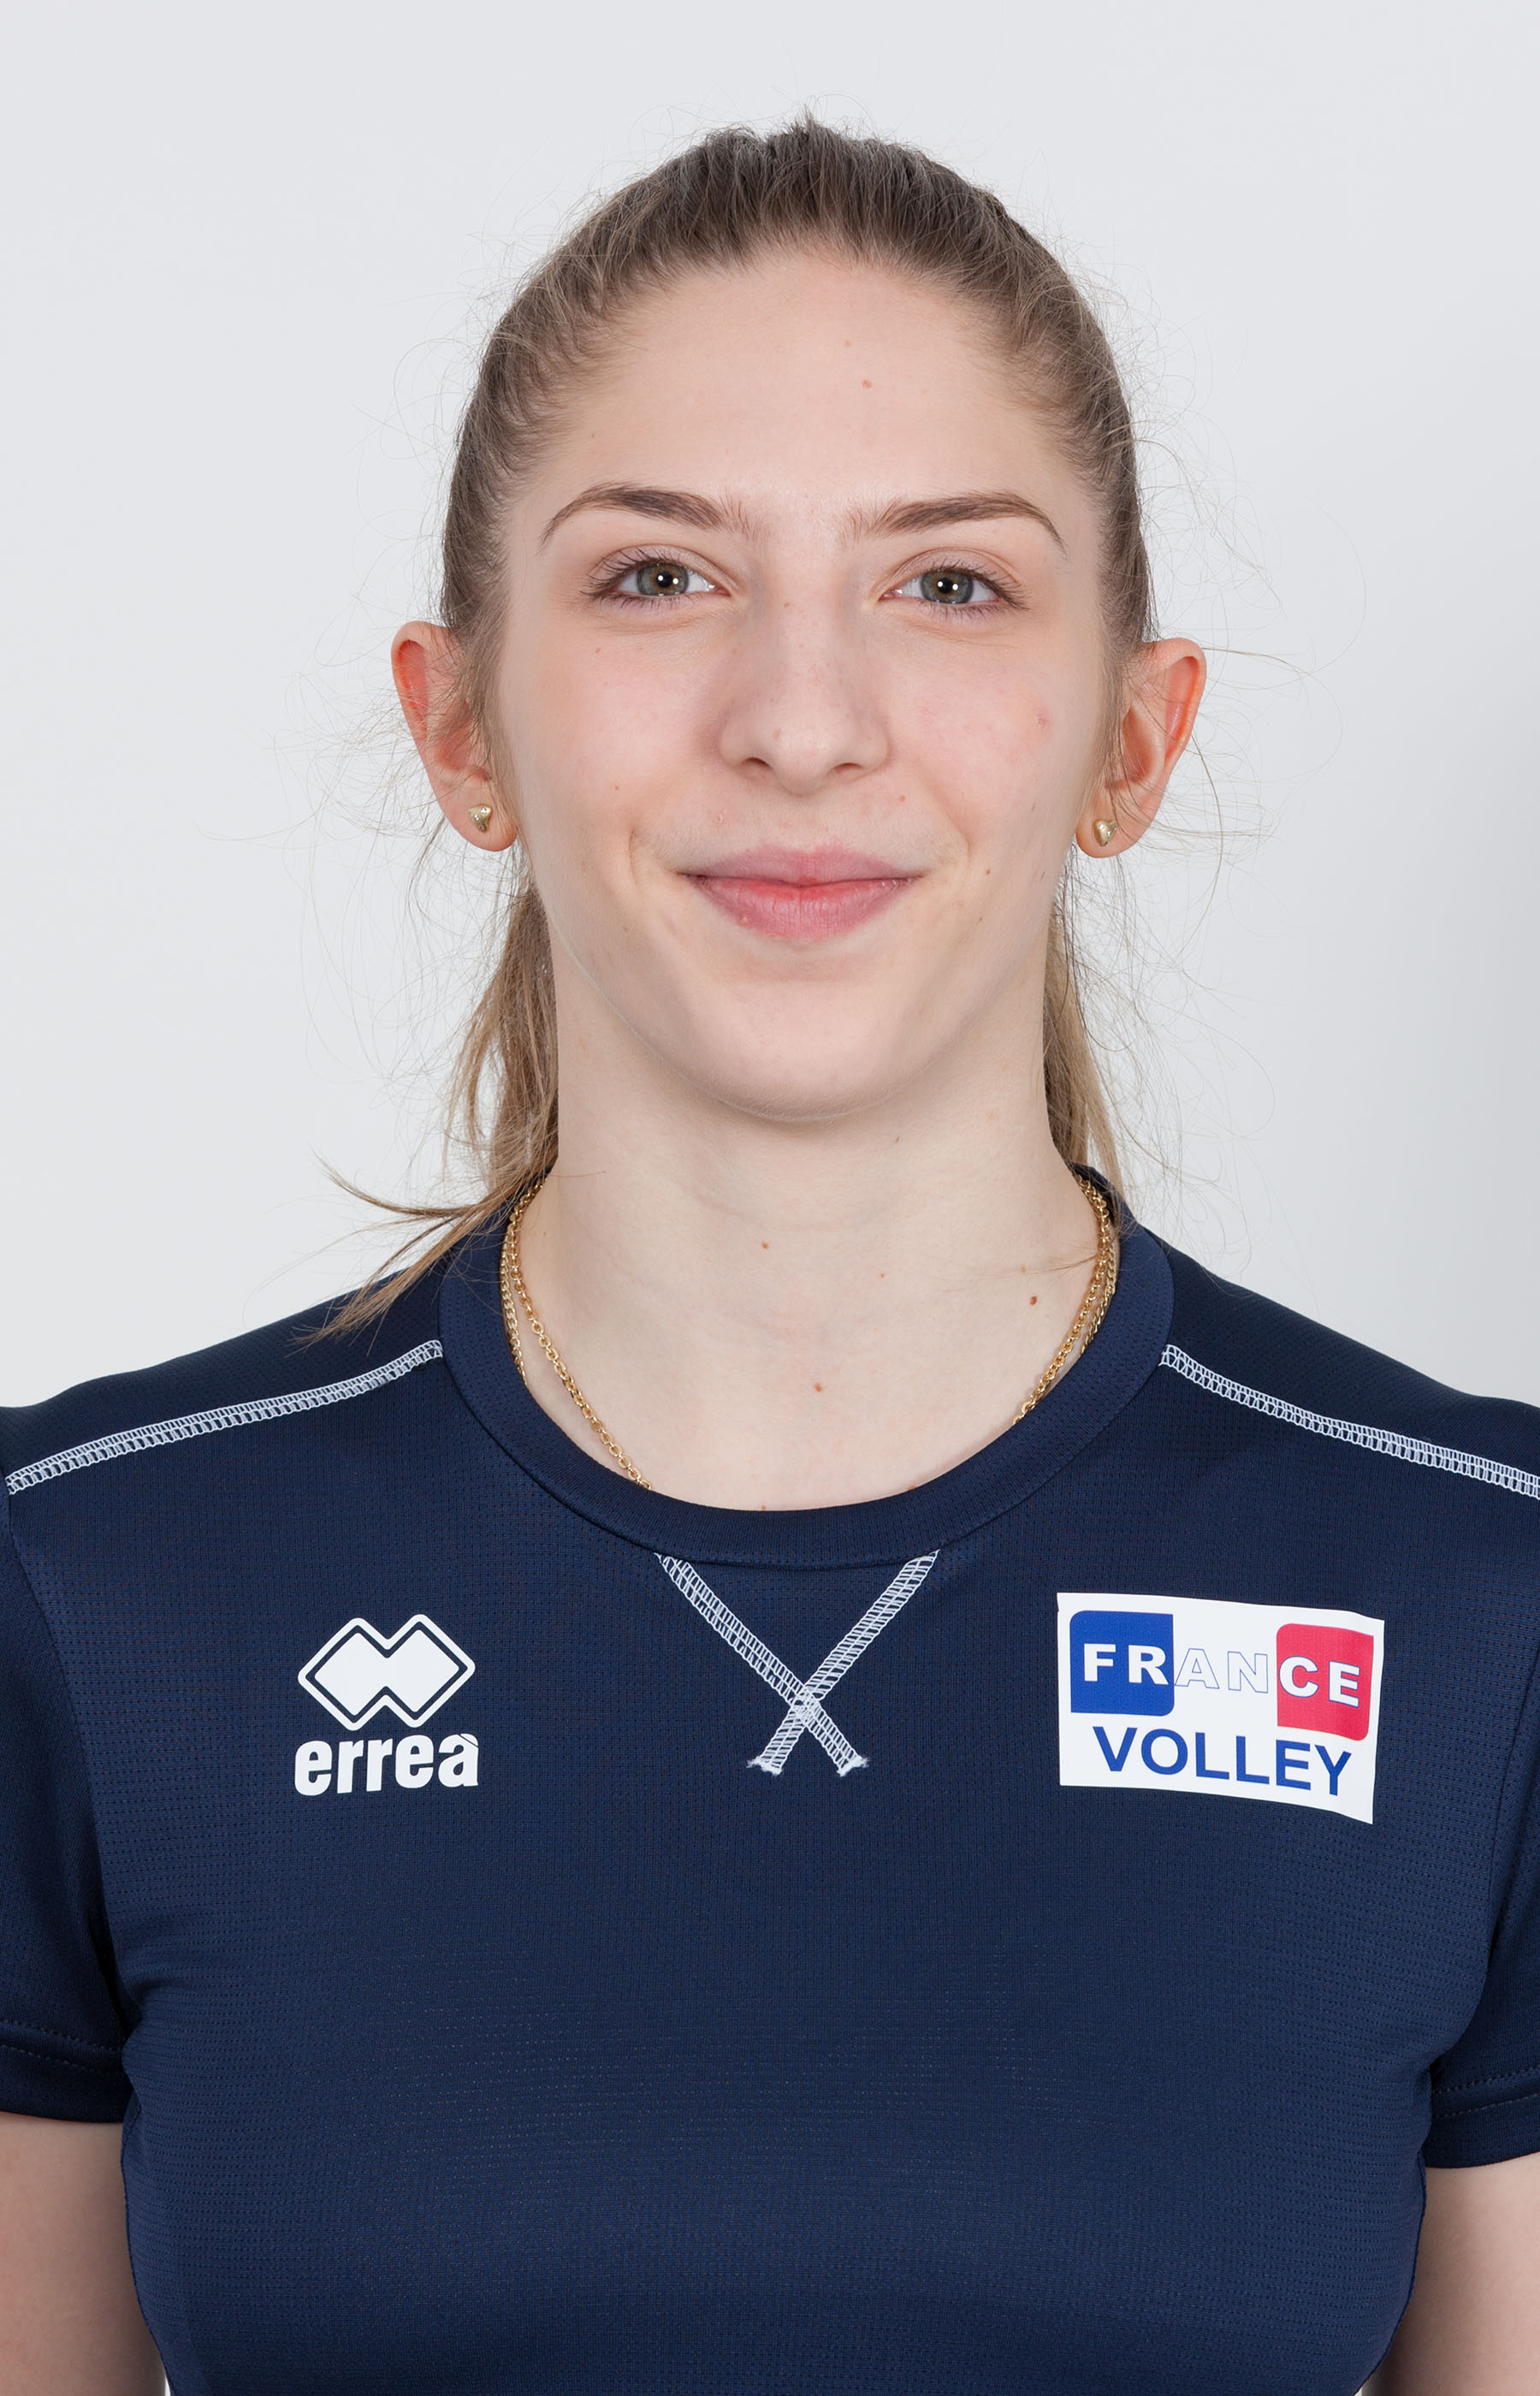 Nina Stojiljkovic